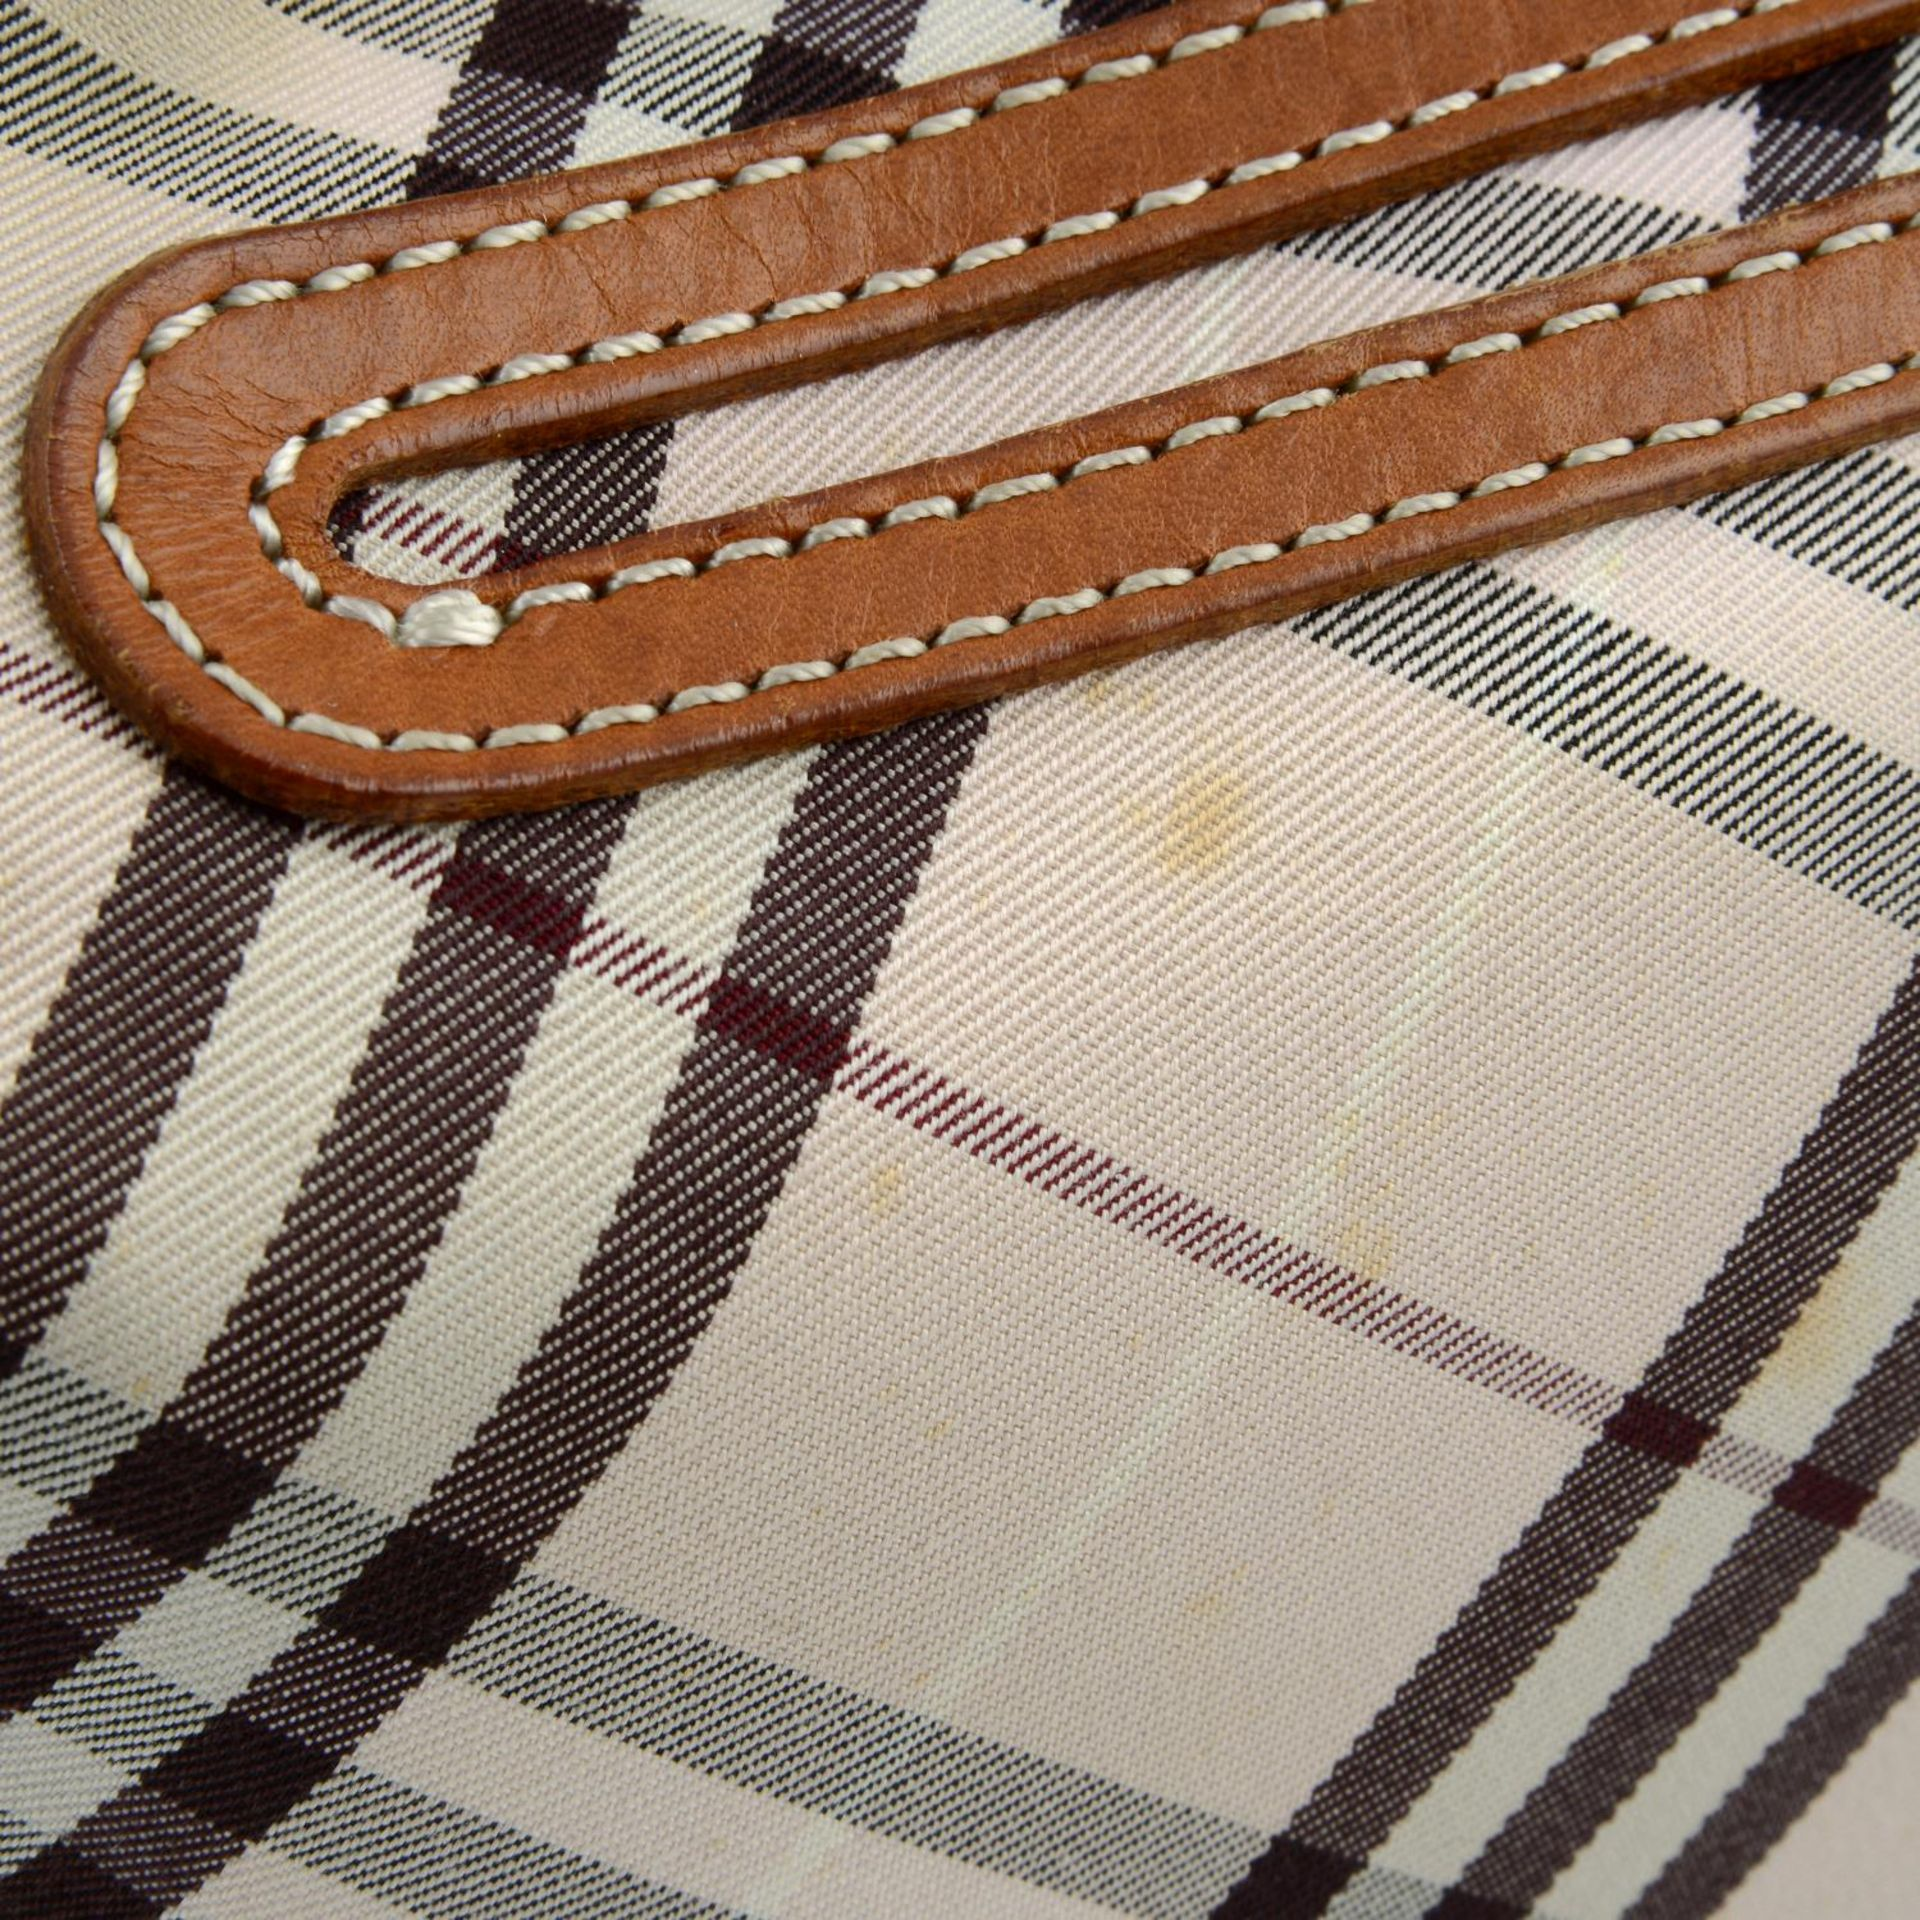 BURBERRY - a Blue Label reversible handbag. - Image 5 of 5